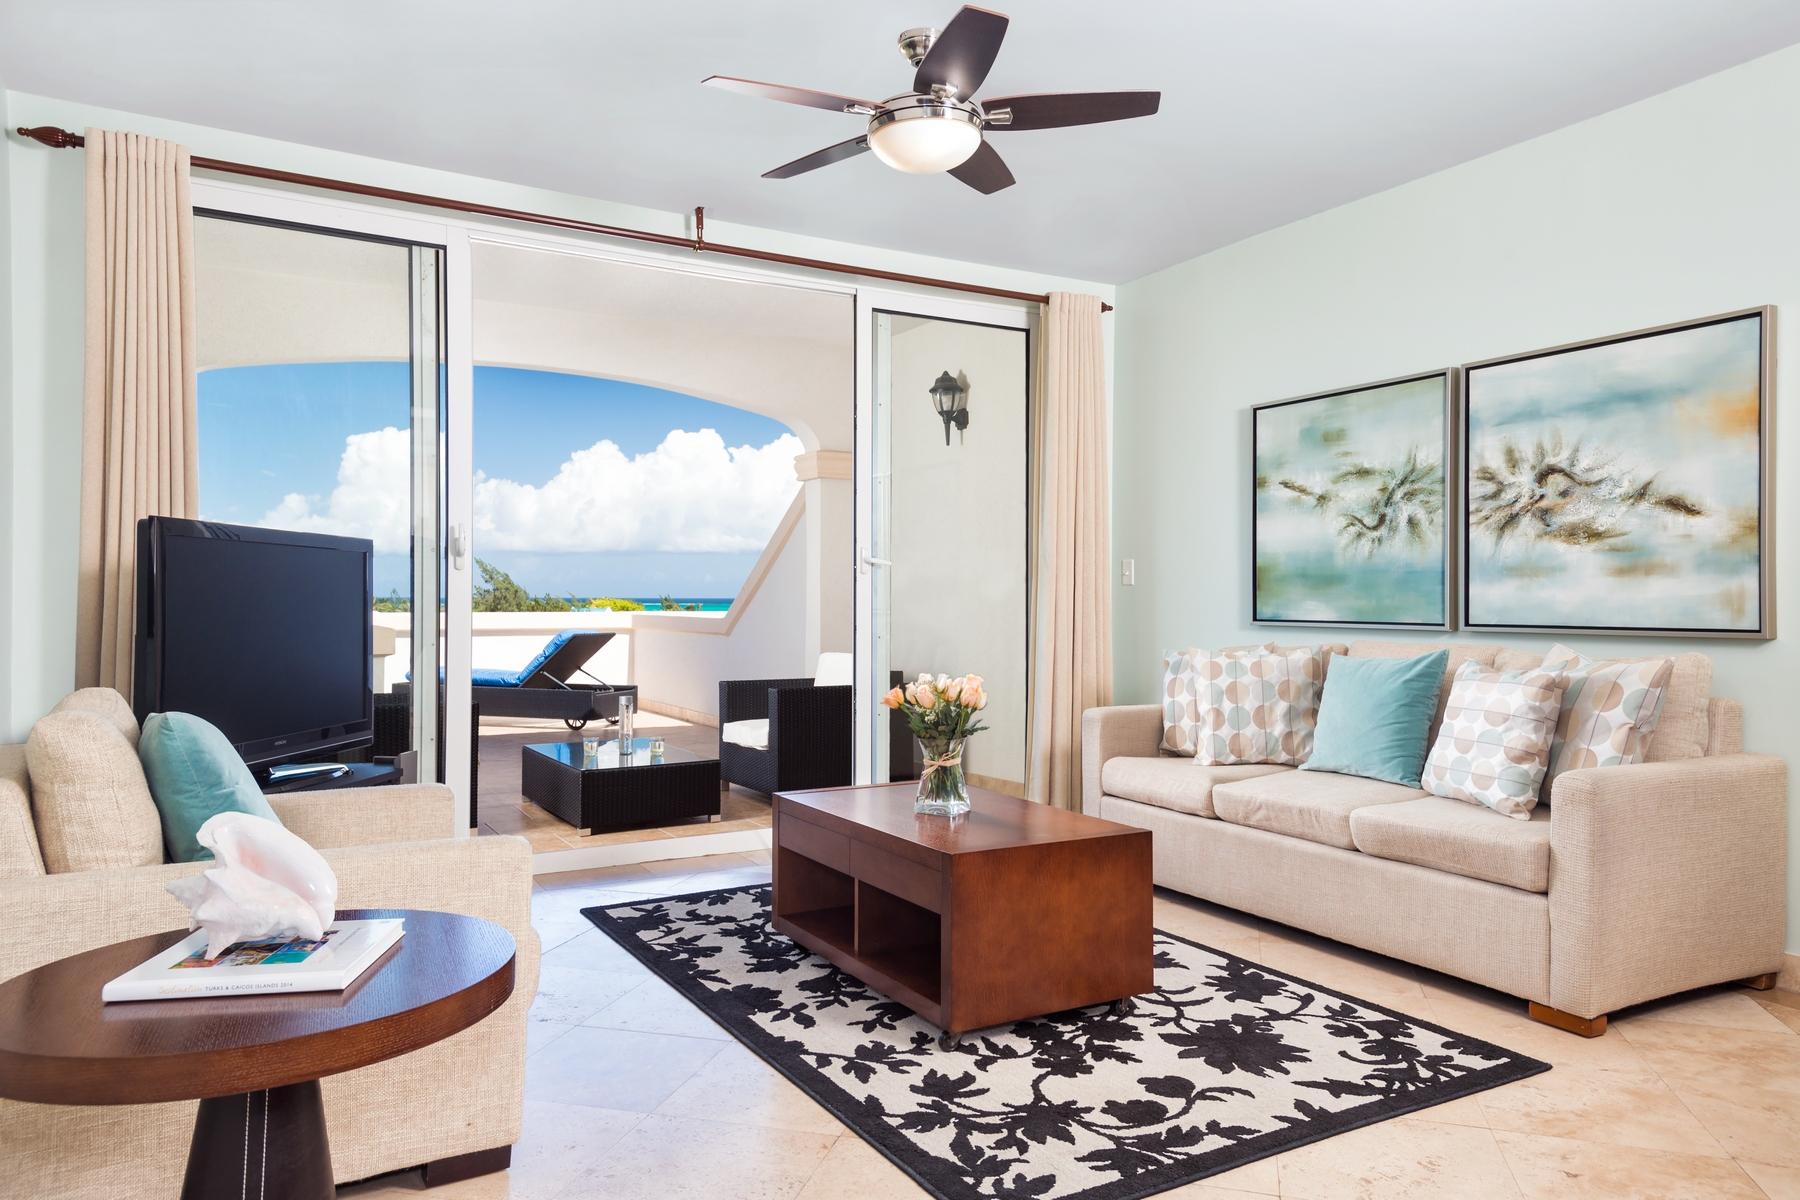 Condominium for Sale at La Vista Azul - 5306 La Vista Azul, Turtle Cove, Providenciales Turks And Caicos Islands